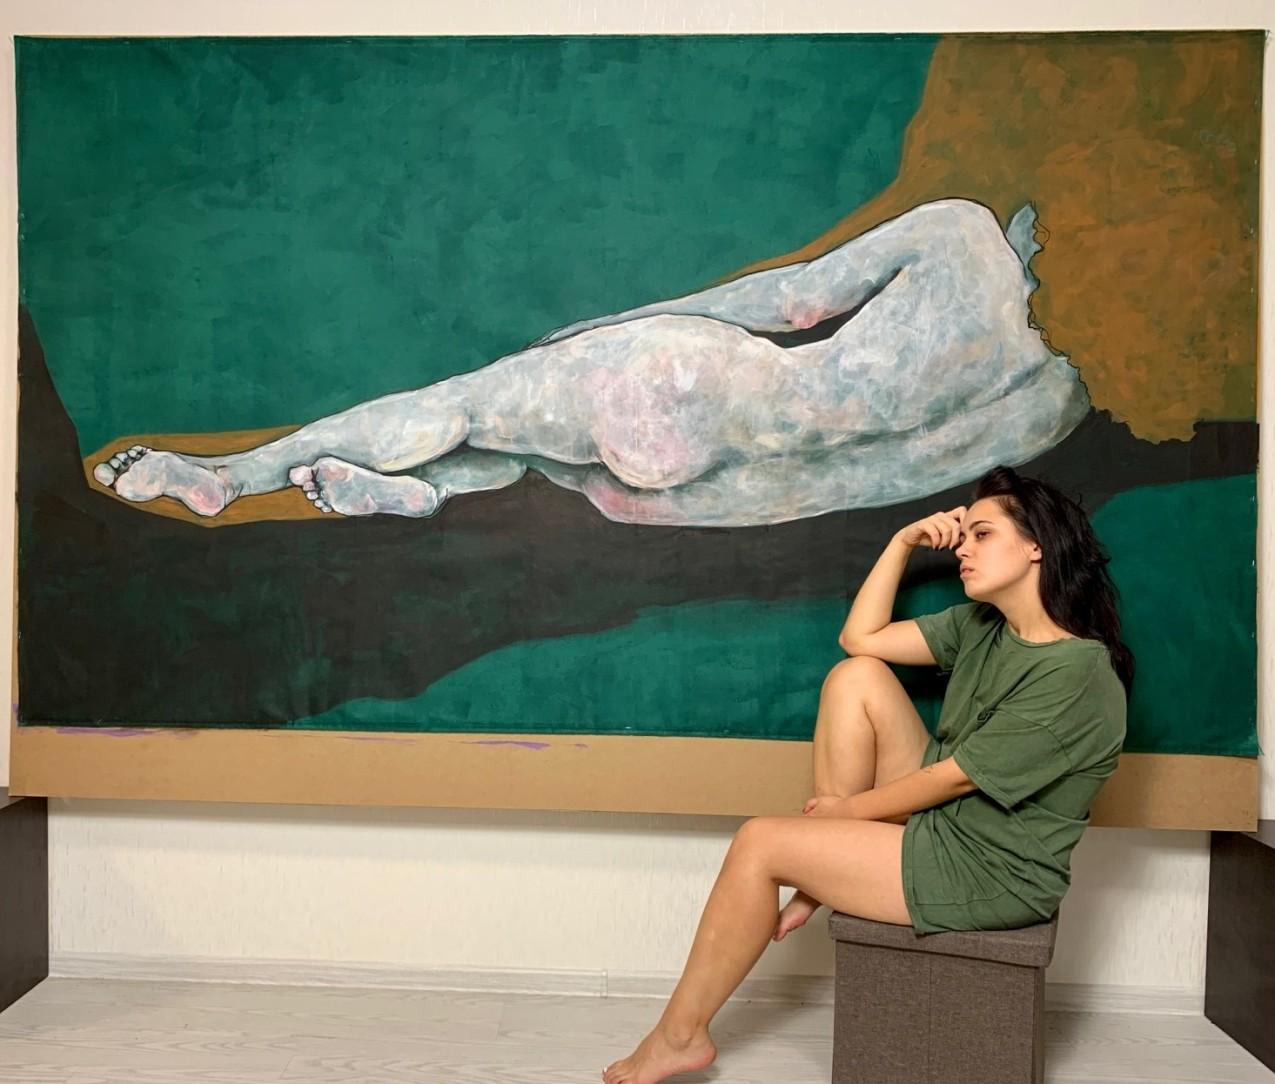 Anastasiia Usenko, a Ukrainian Artist Glorifying Daily Normality